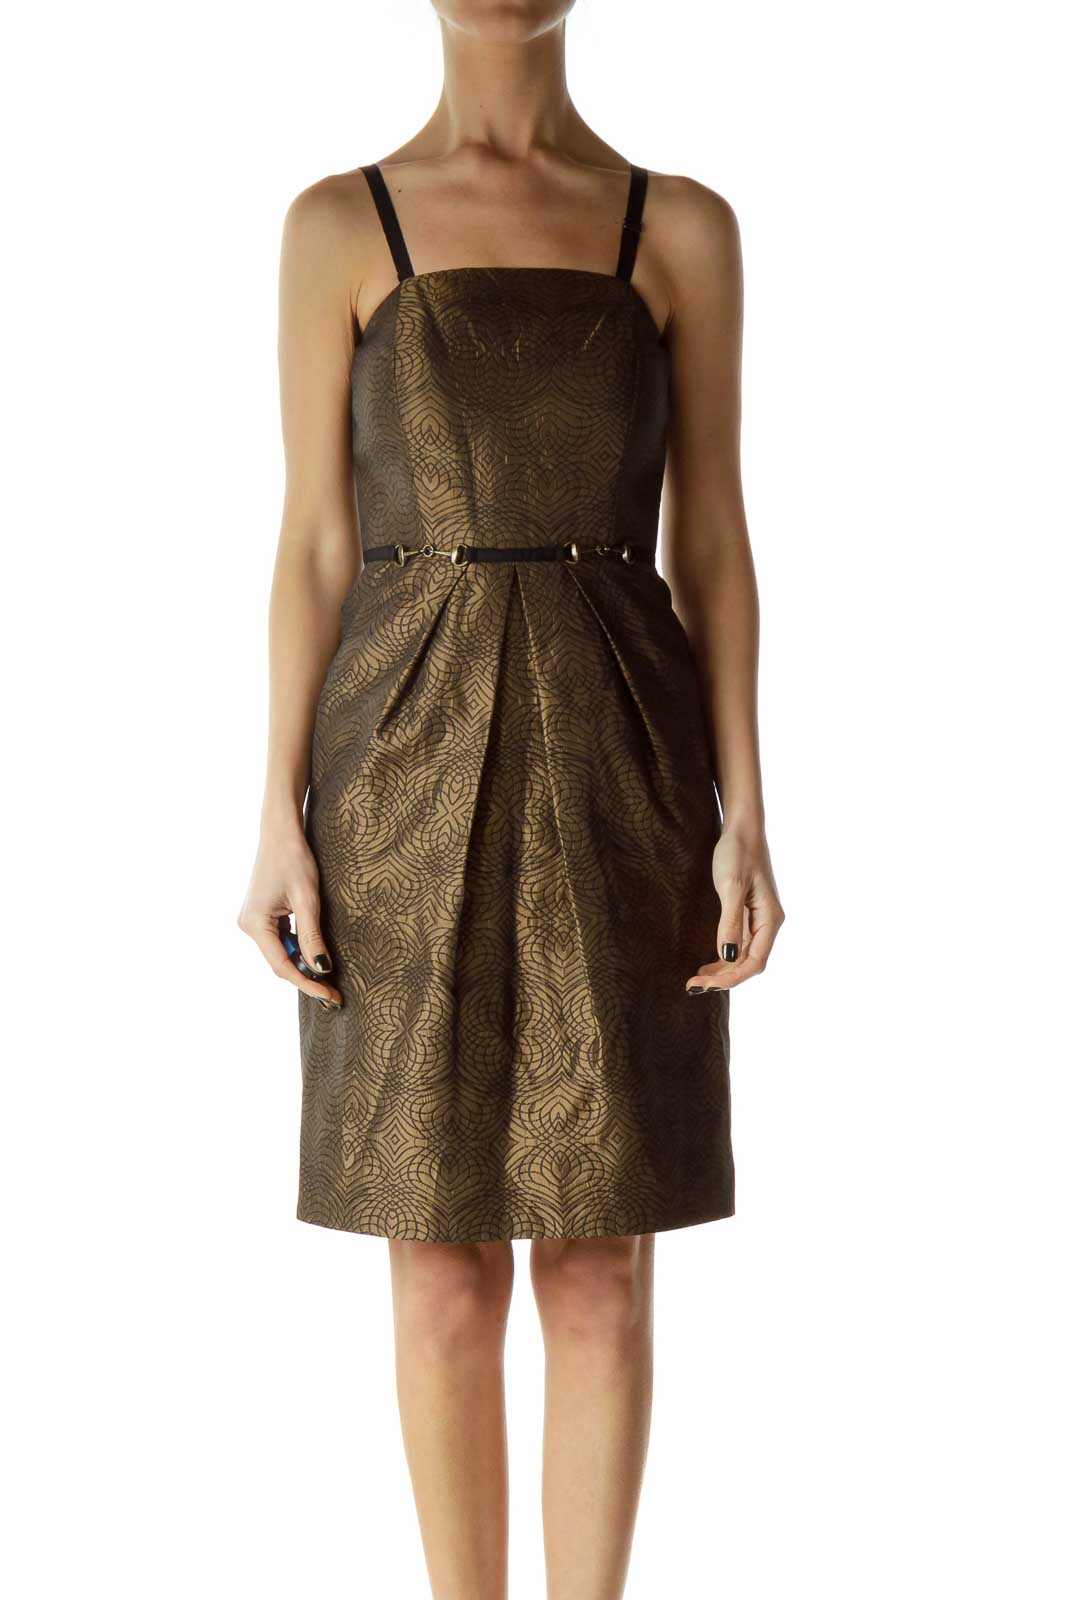 Brown Metallic Printed Cocktail Dress